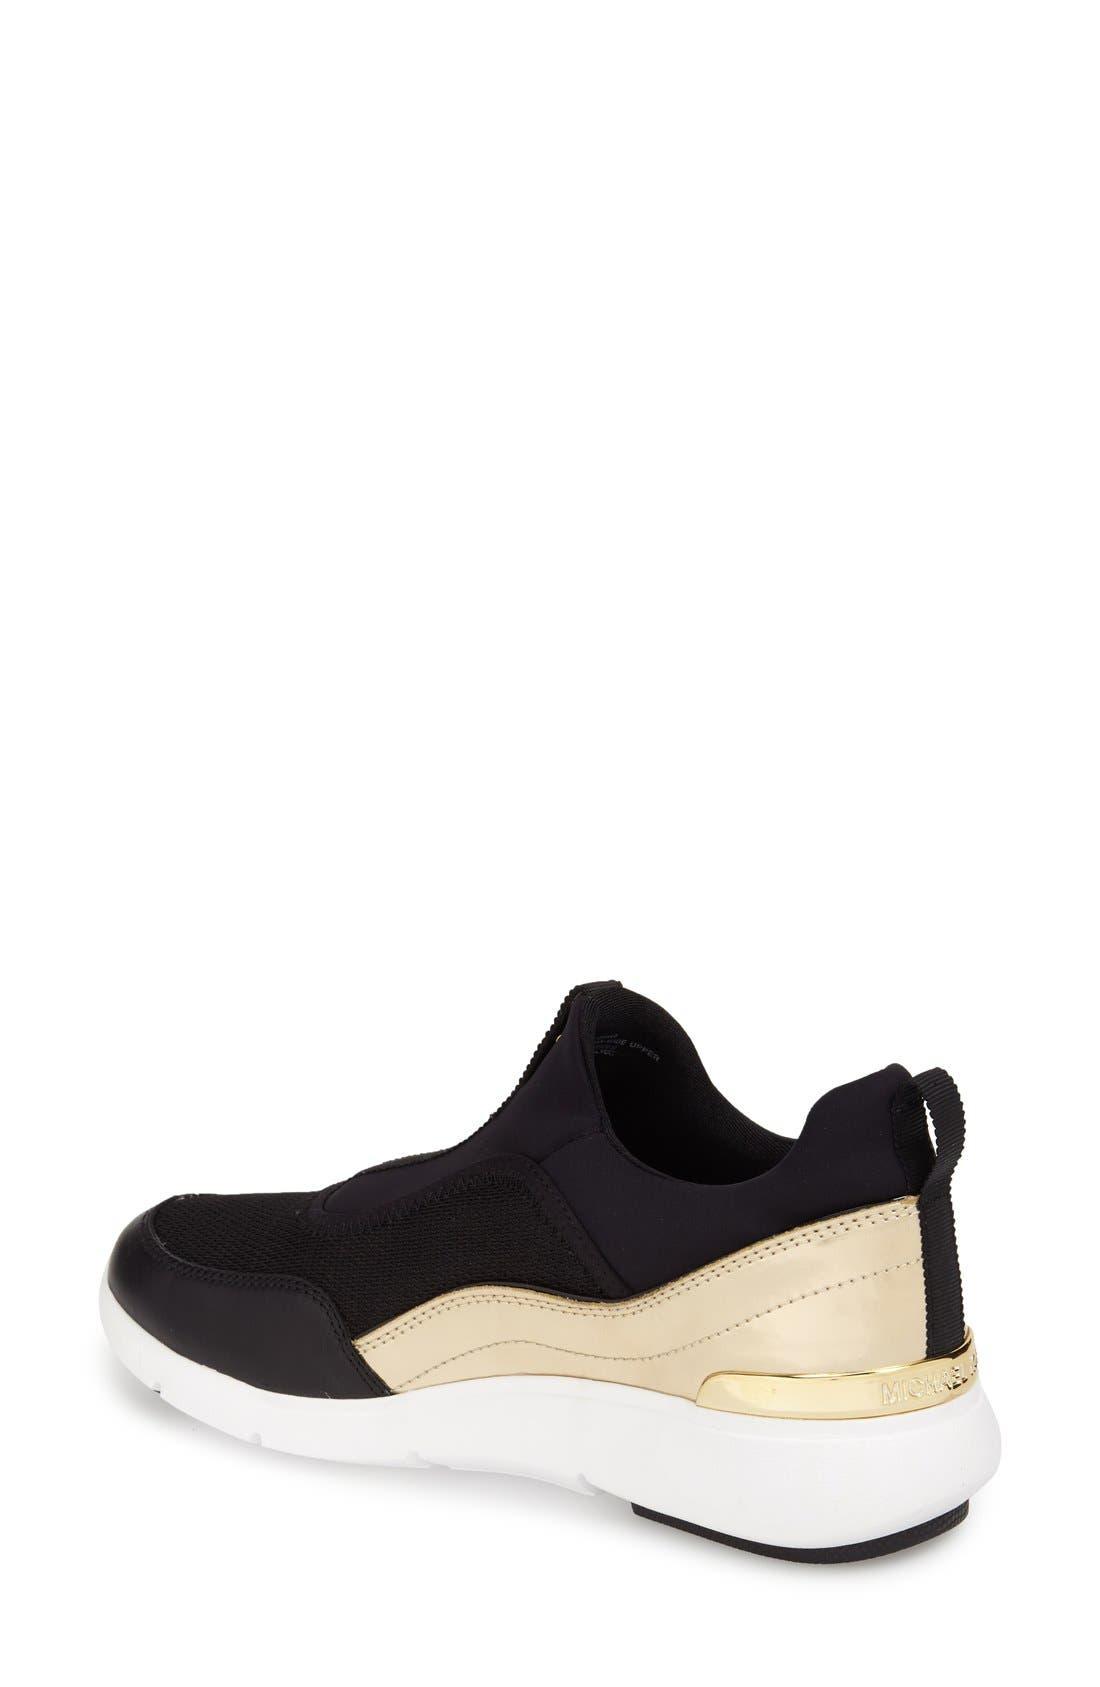 Alternate Image 2  - MICHAEL Michael Kors 'Ace' Sneaker (Women)